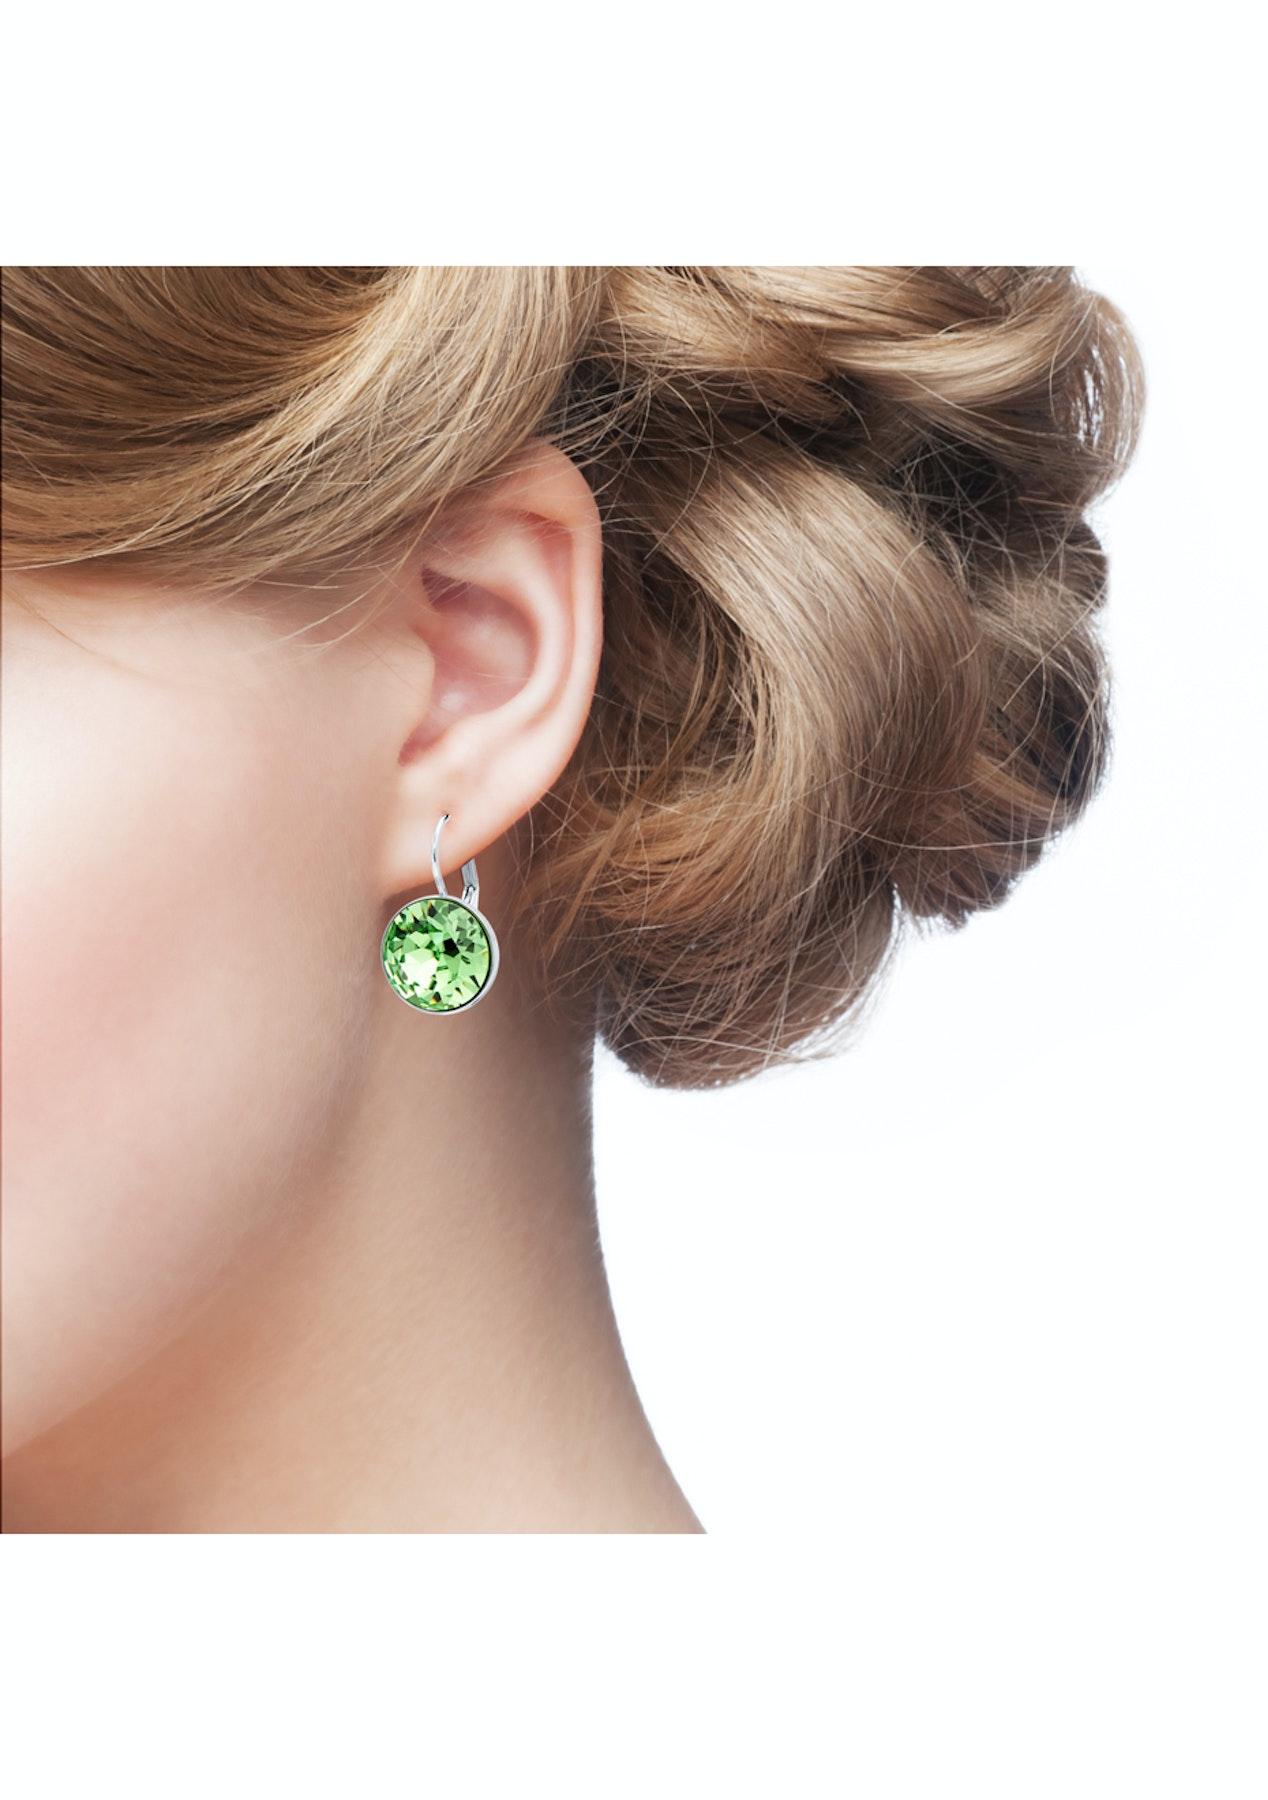 b9271aac4d2a Krystal Cotoure - Bella Drop Earrings with Peridot Swarovski Crystals  Bridal Wedding WGP MYJS - My Jewellery Store Swarovski Elements Jewellery  Under  40 - ...